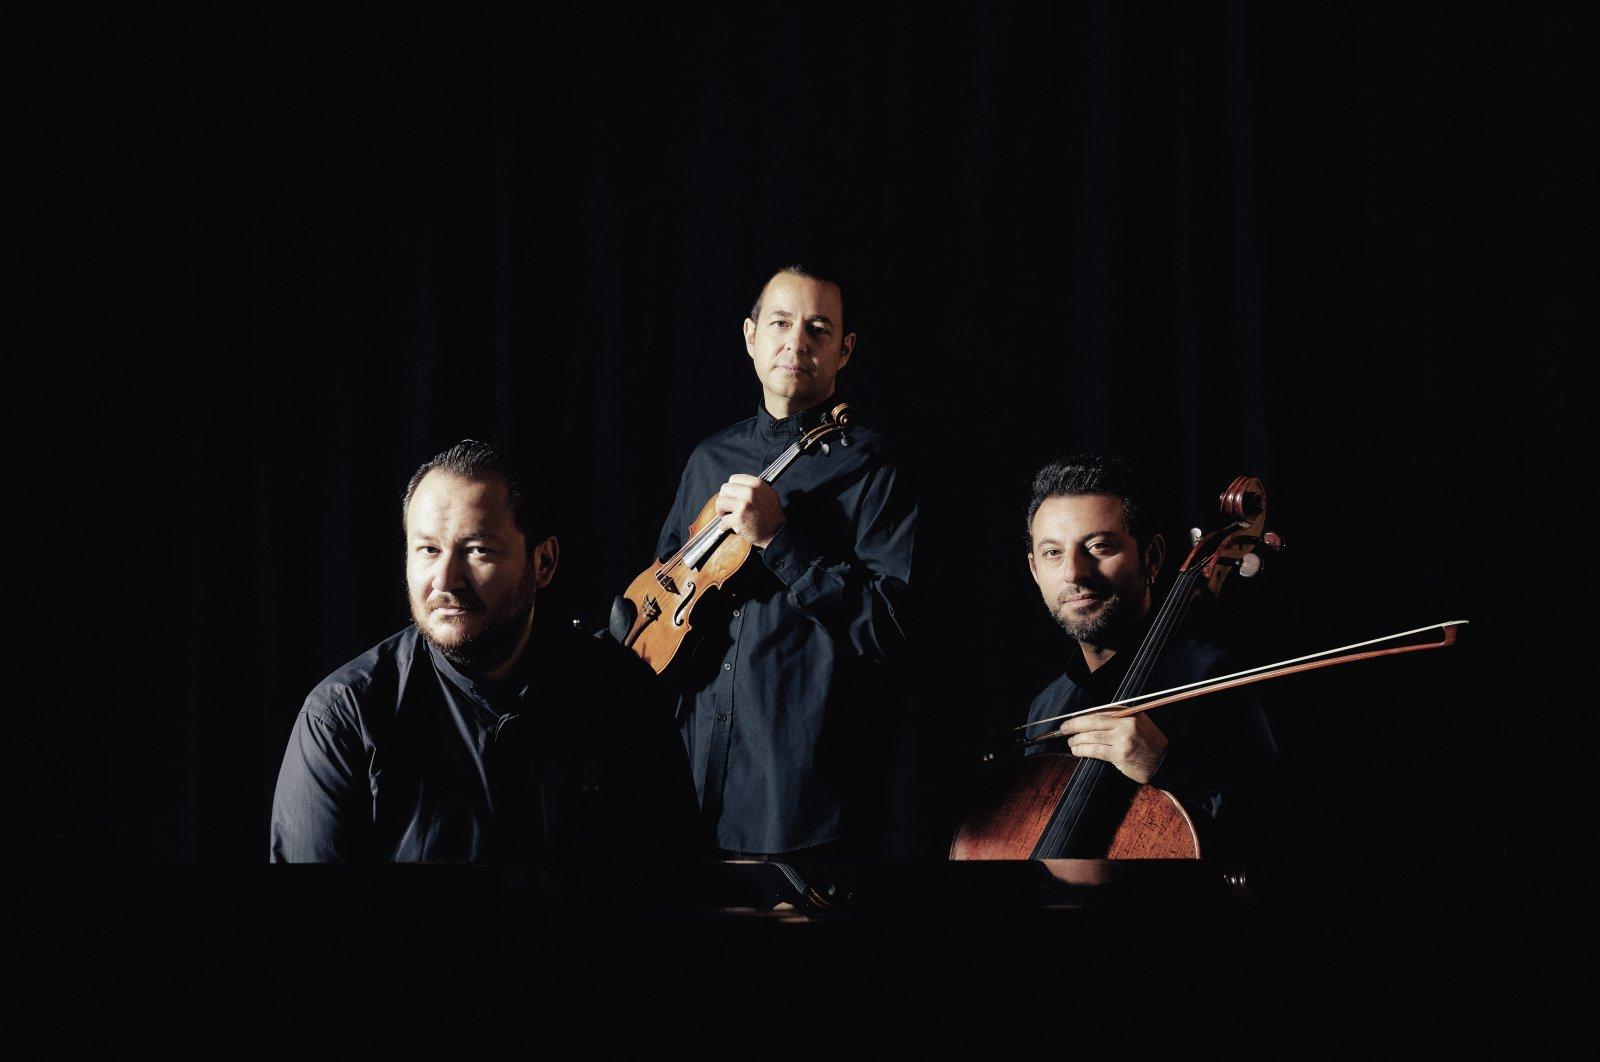 Trio Hexis' online performance will meet listeners on Jan. 28.